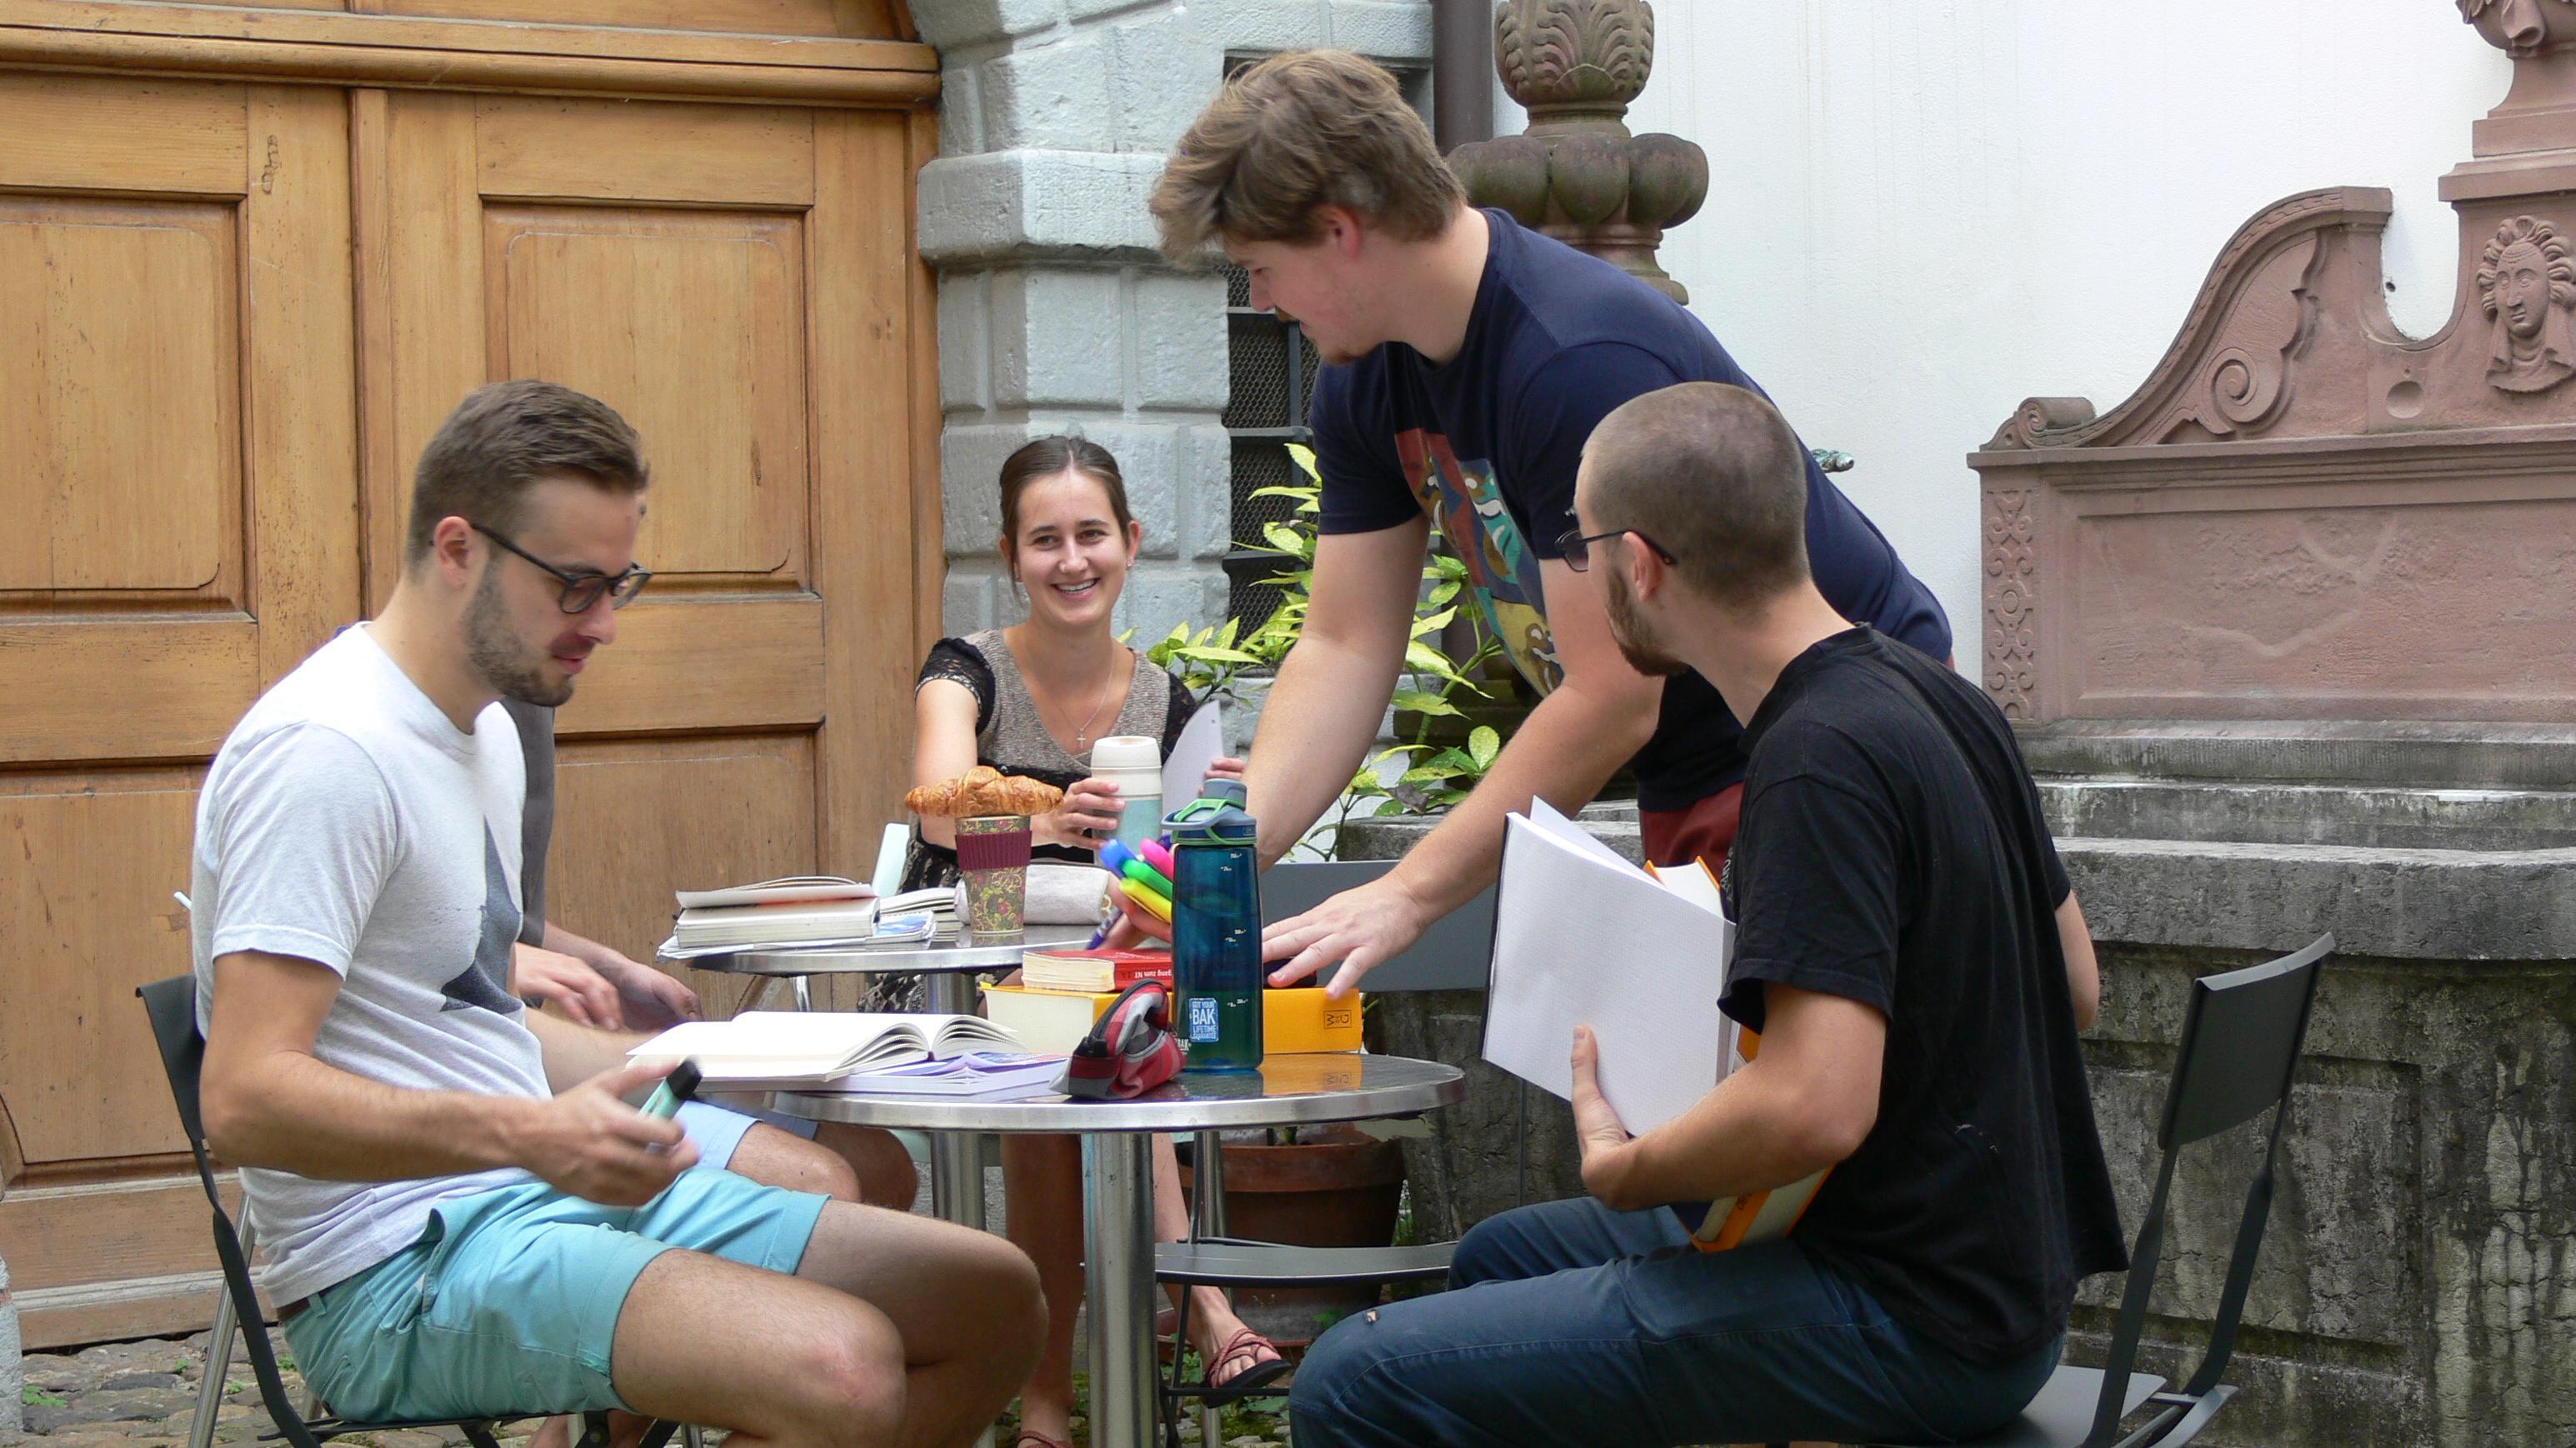 Studierende im Innenhof